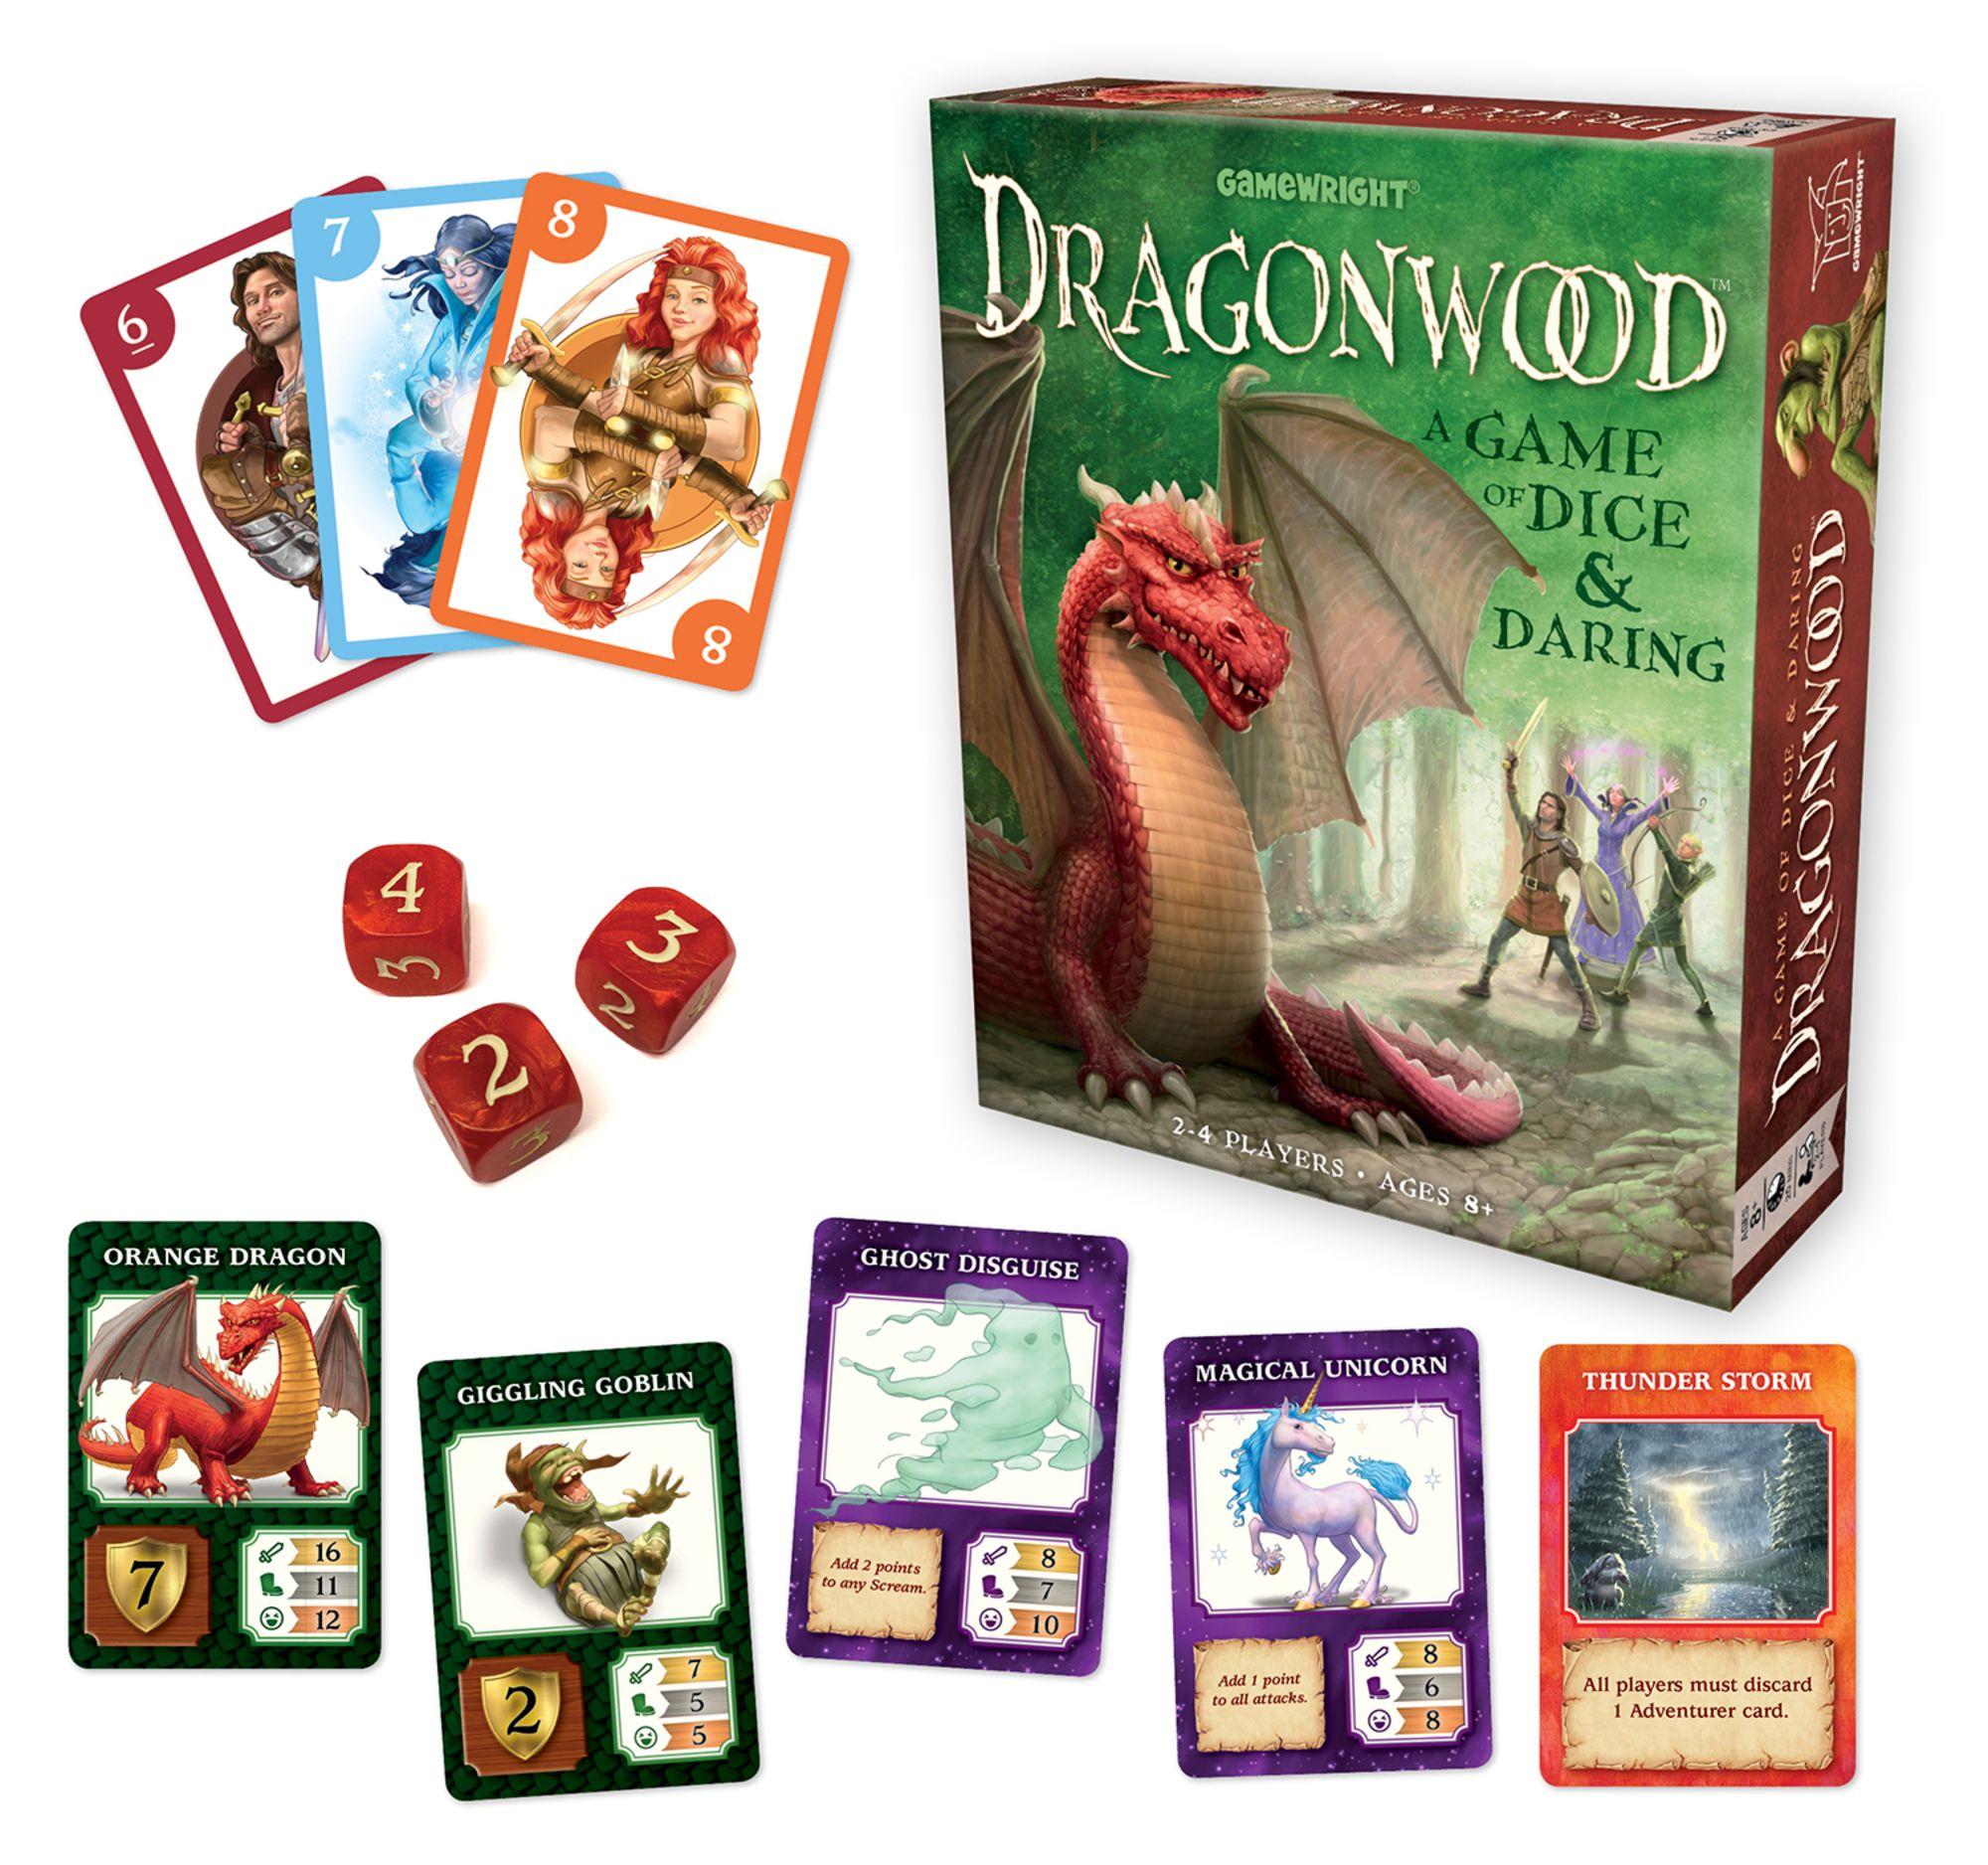 DragonwoodTM Dice games, Fun board games, Games